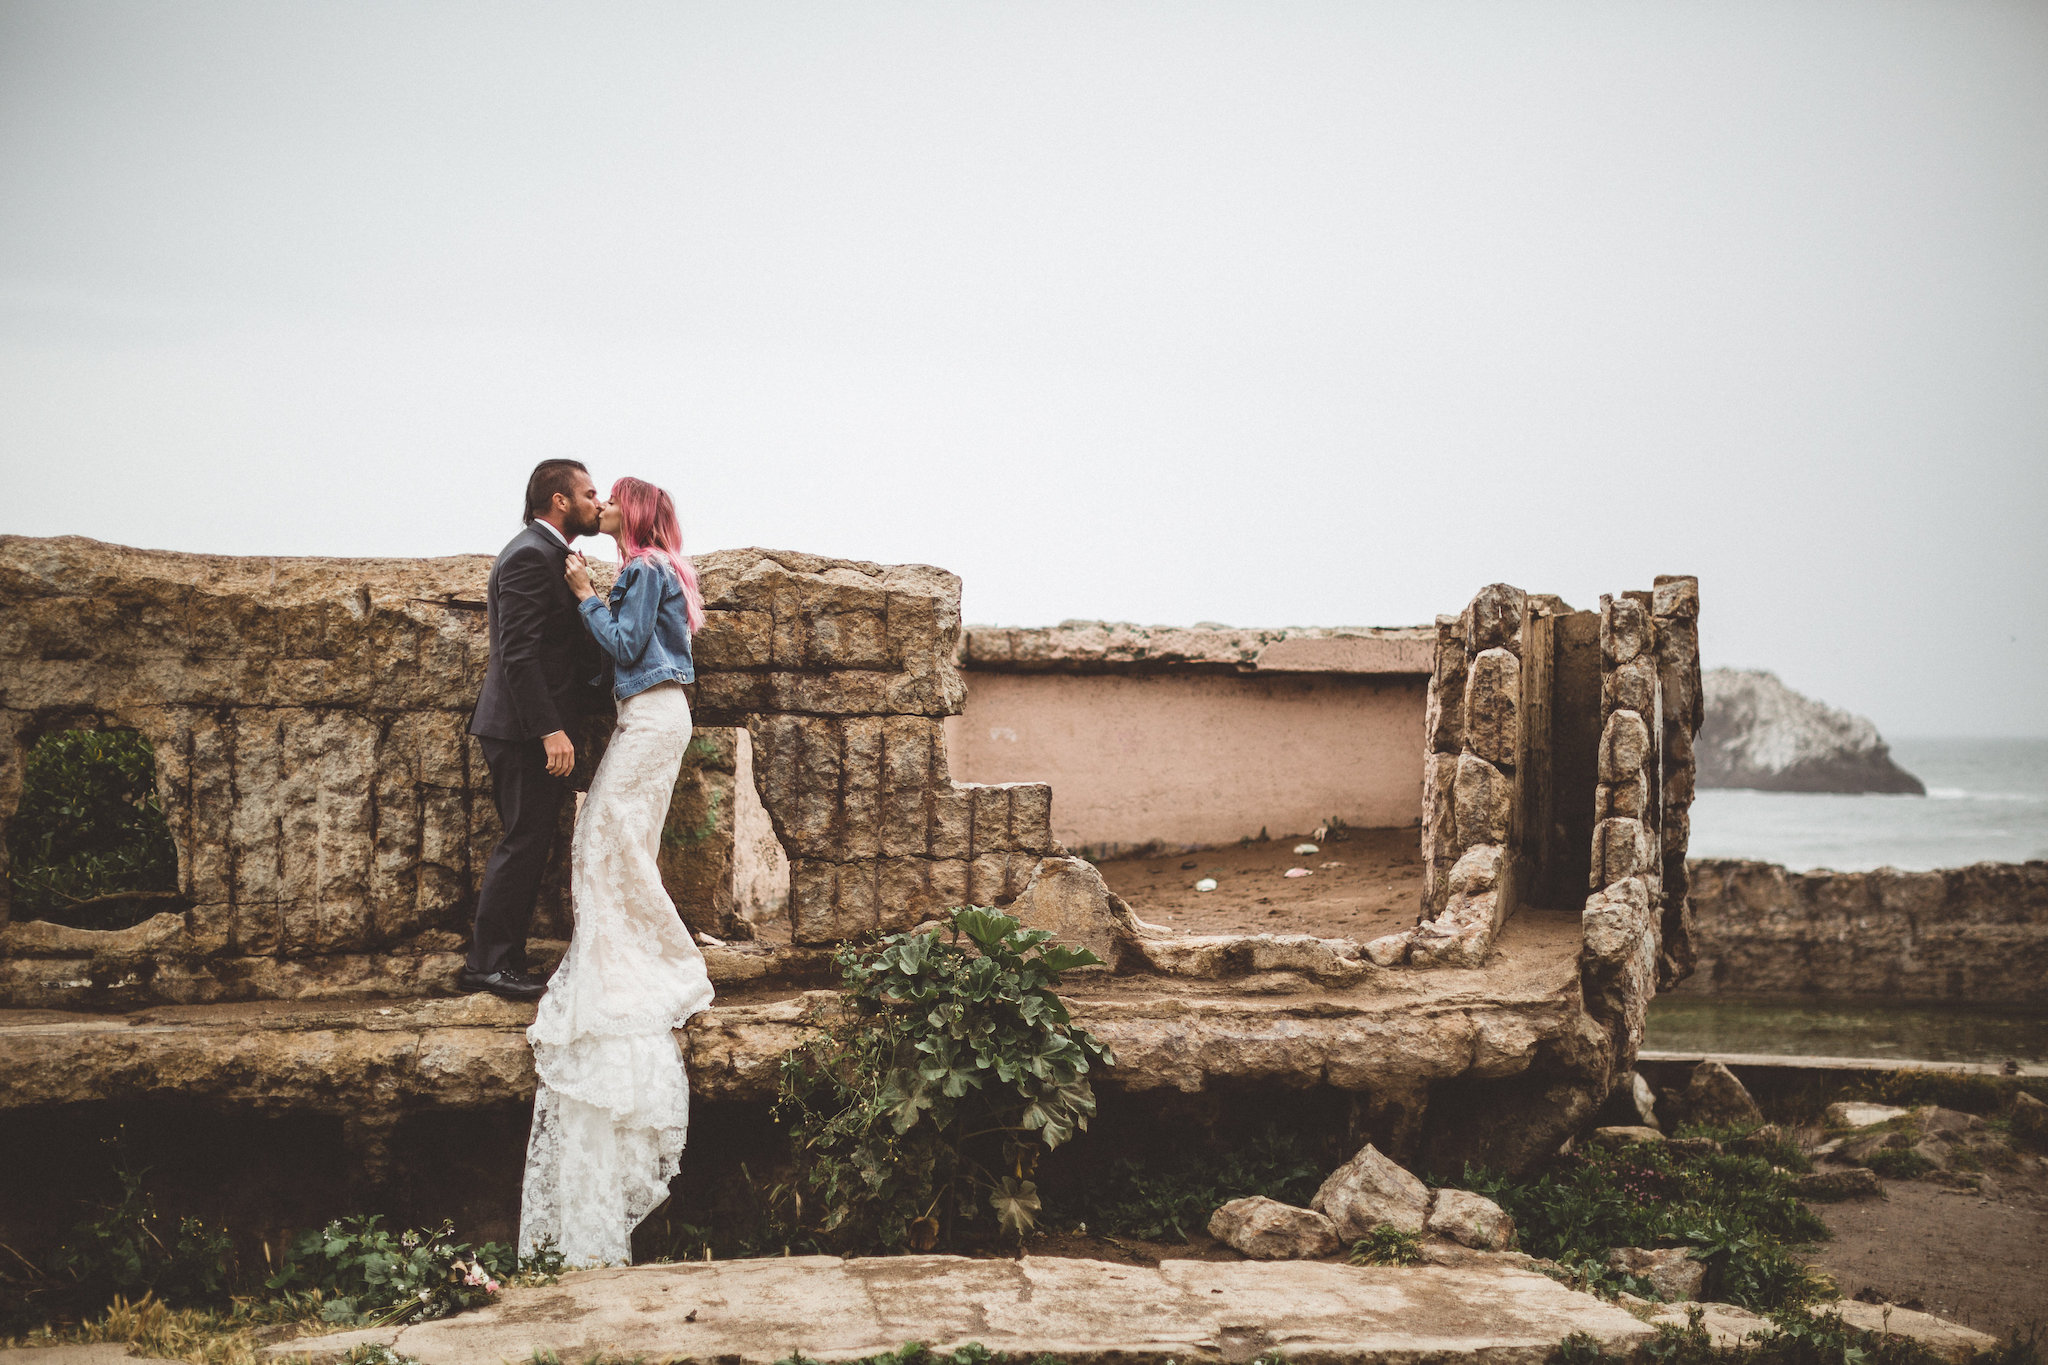 kris-and-andreas-san-francisco-elopement-adventure62.jpg